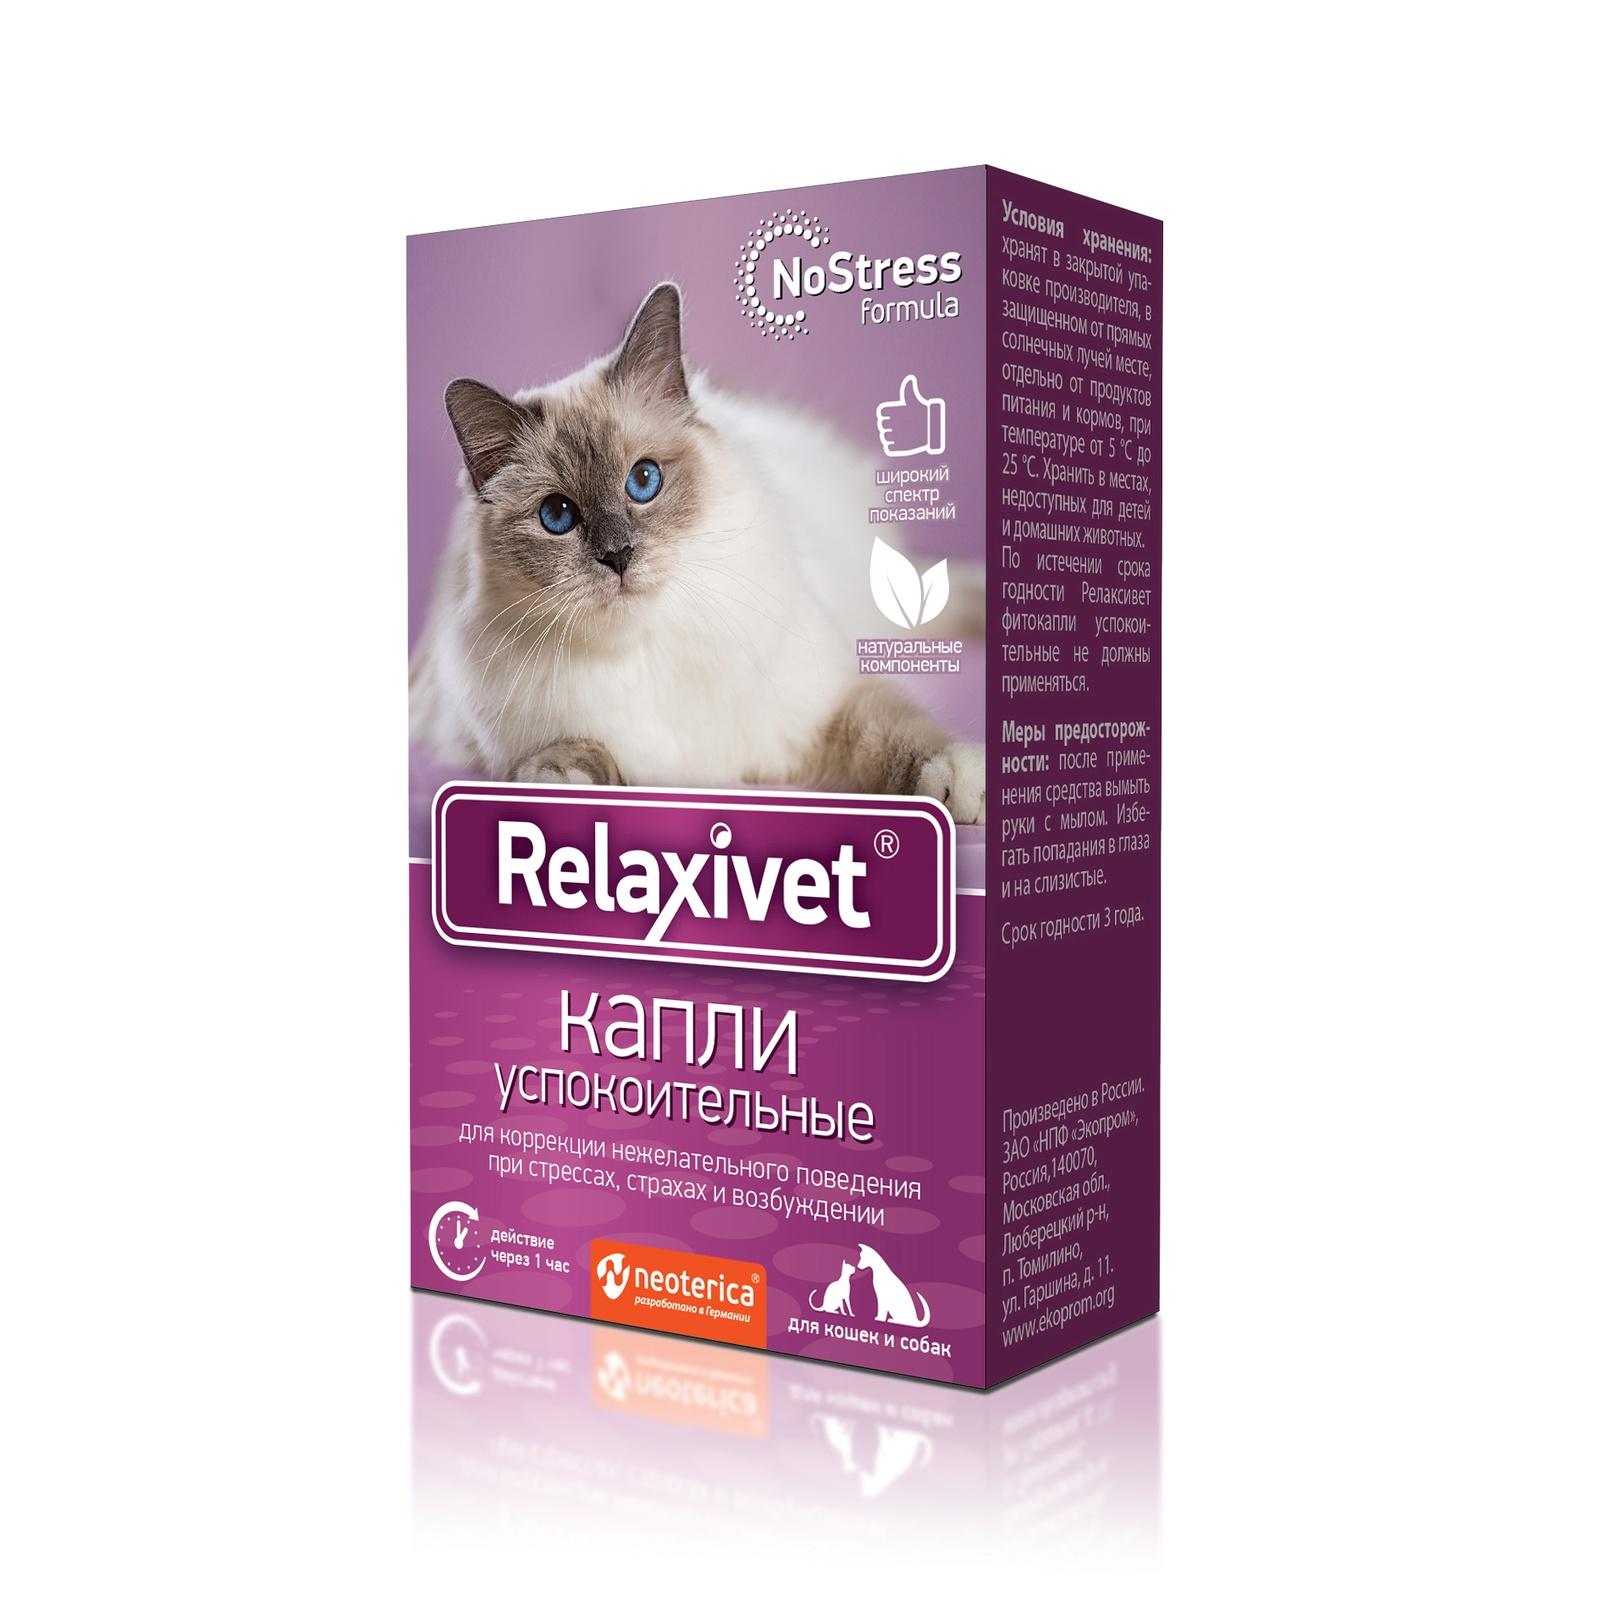 RelaxivetКапли успокоительные (35 гр) Relaxivet